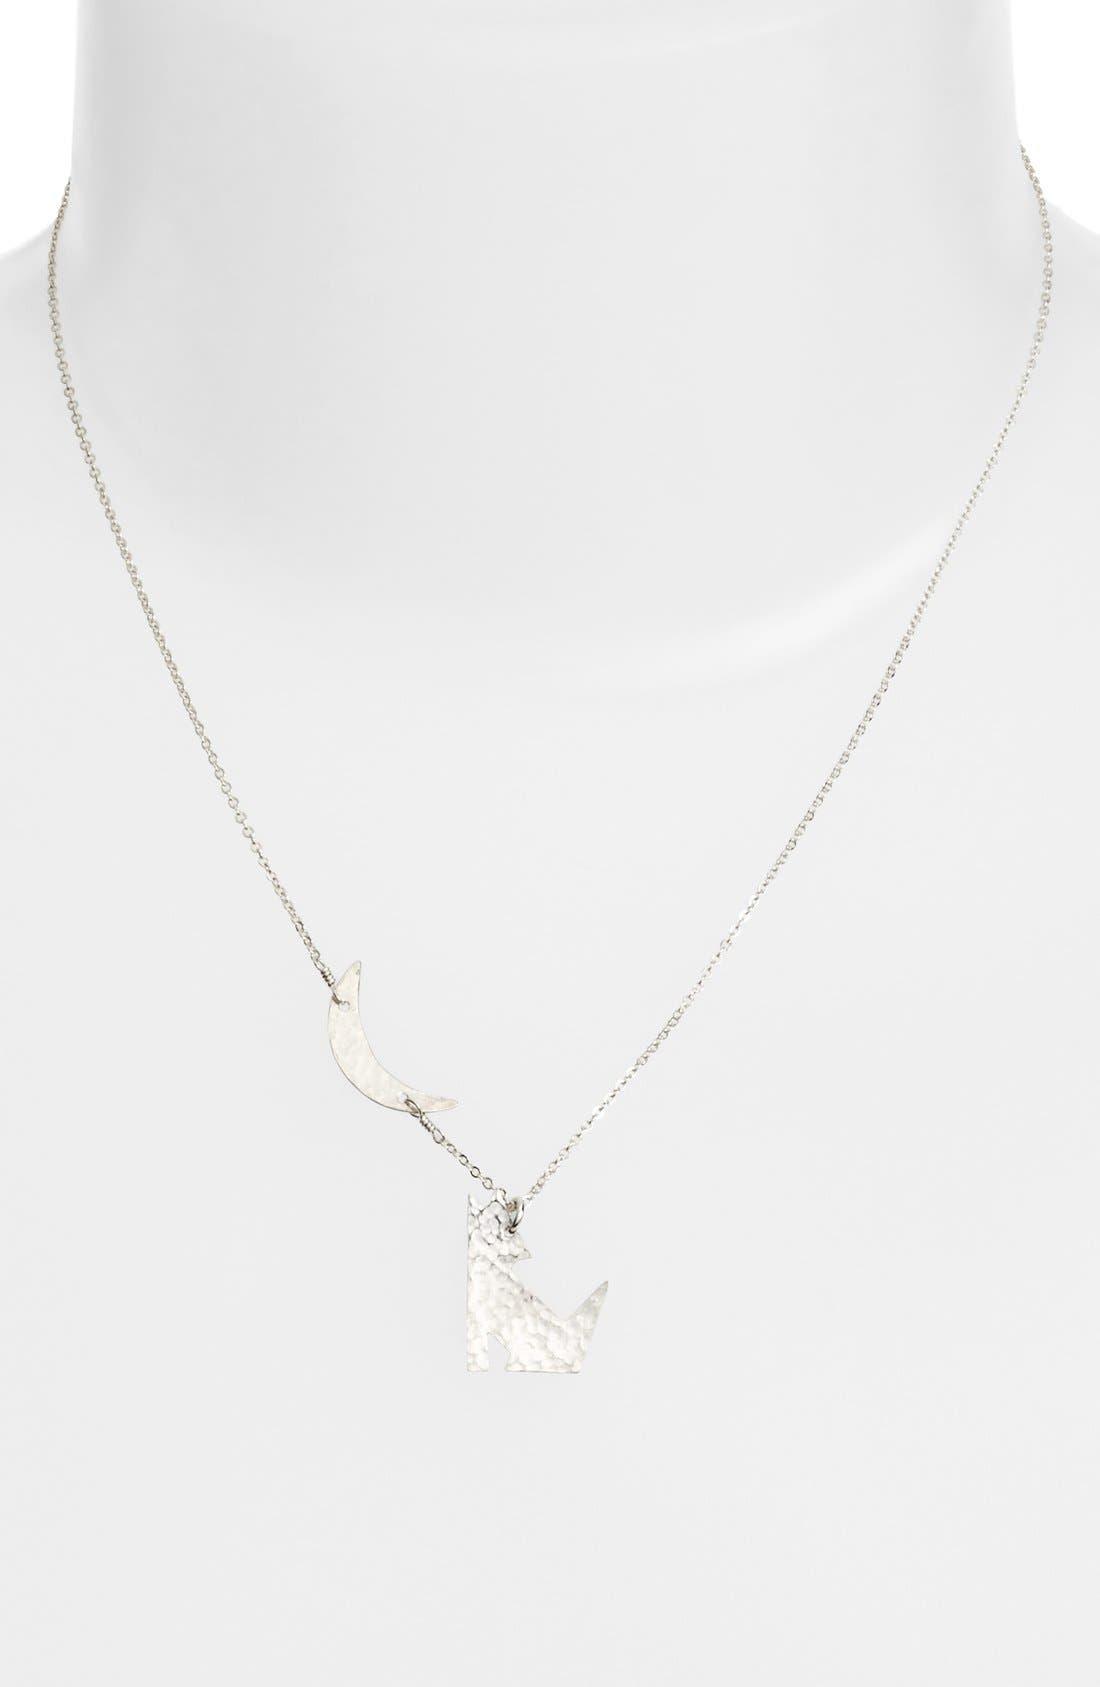 Coyote Pendant Necklace,                         Main,                         color, 040